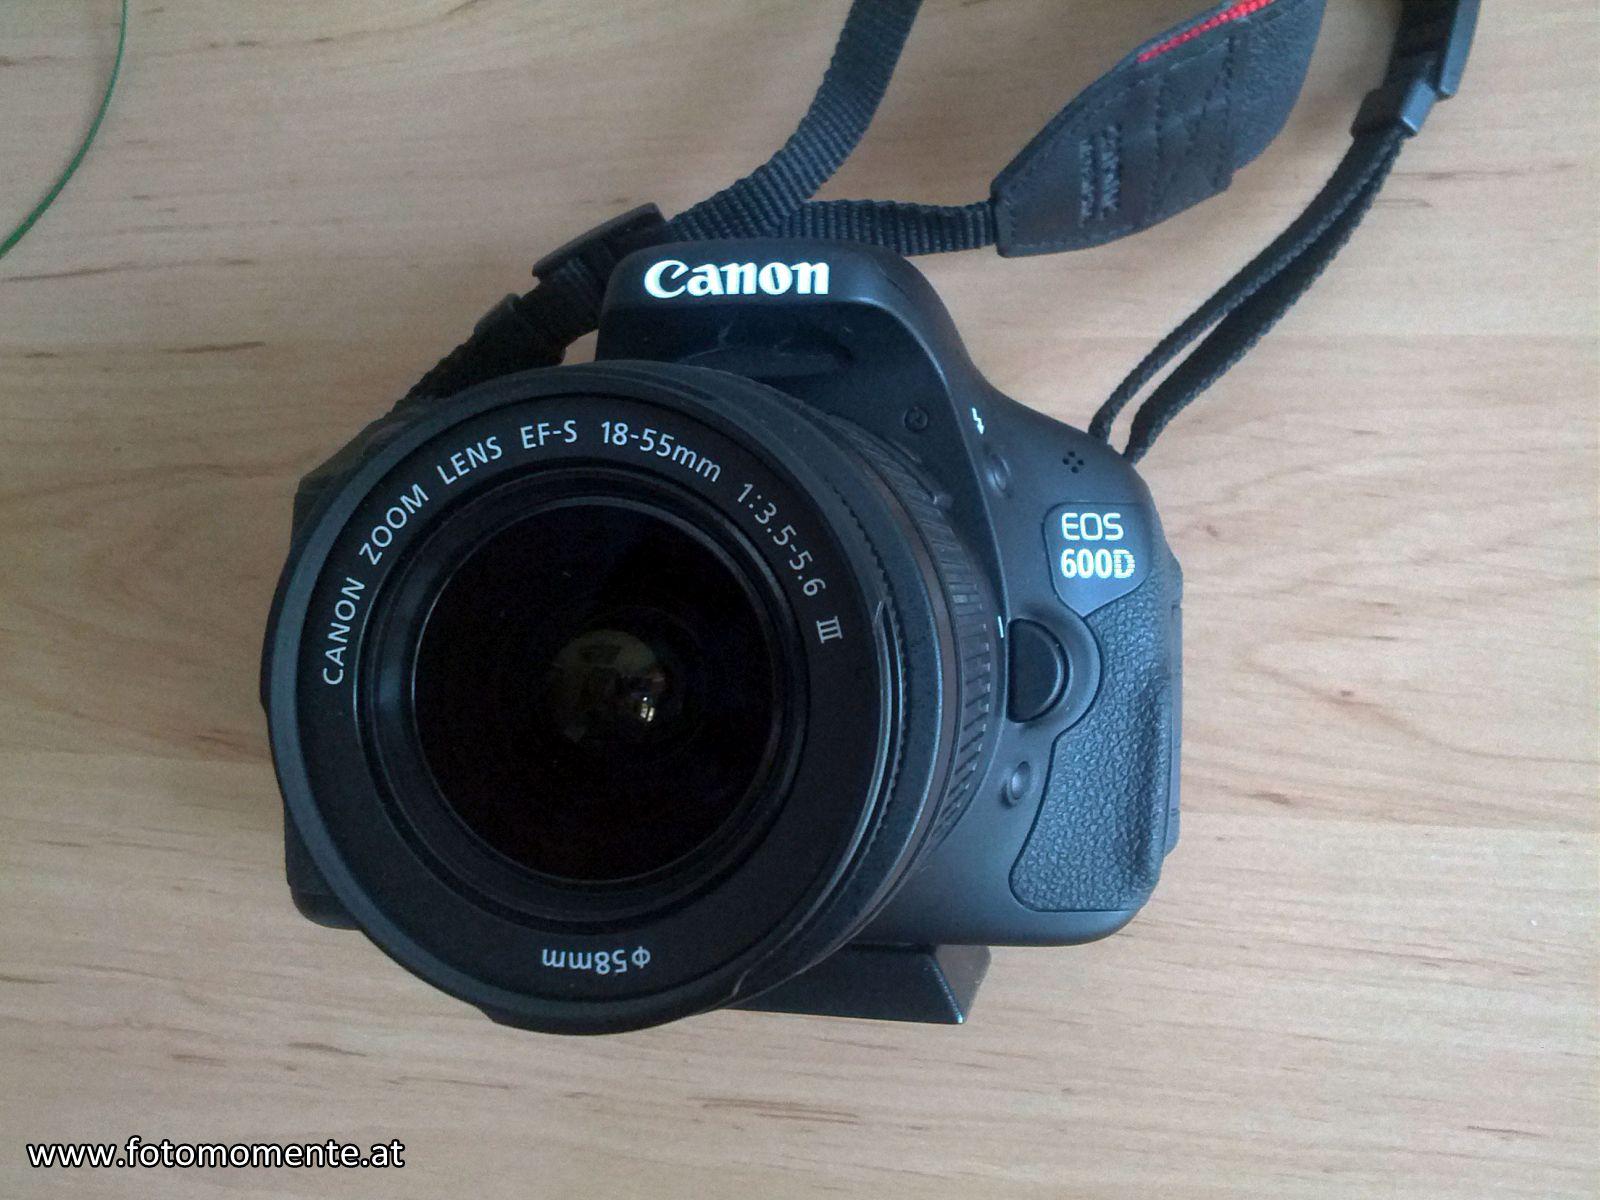 Canon 600D - Canon 600D – Mein Erfahrungsbericht